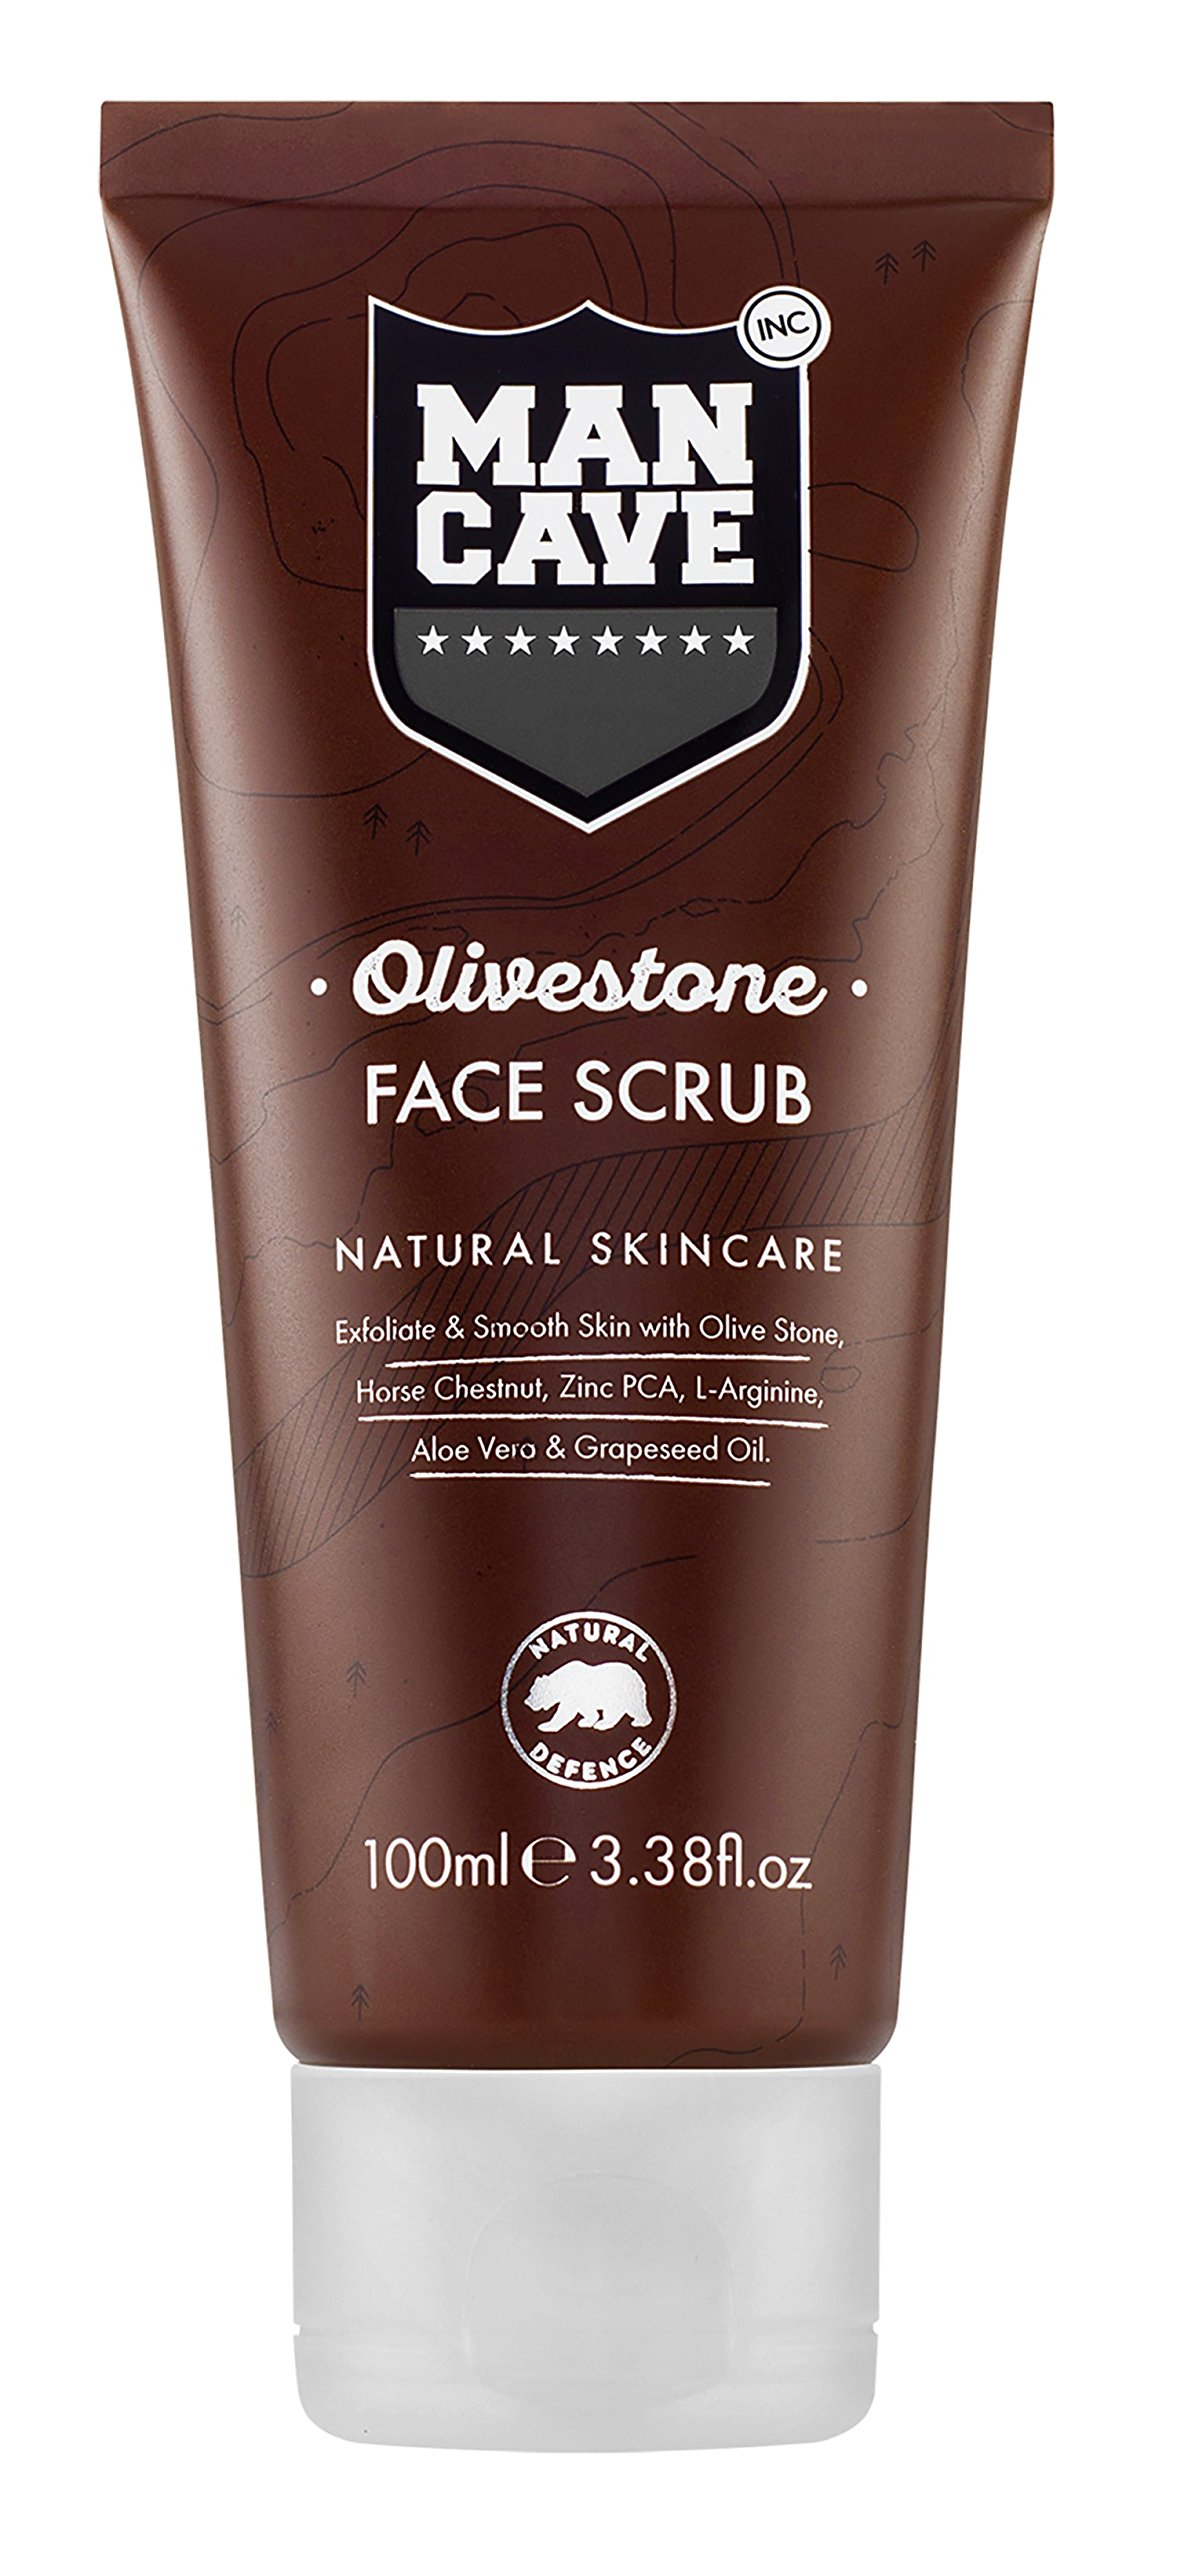 ManCave Original Face Moisturiser, 3.38 Oz Dr. Brandt - Overnight Resurfacing Serum - 50ml/1.7oz